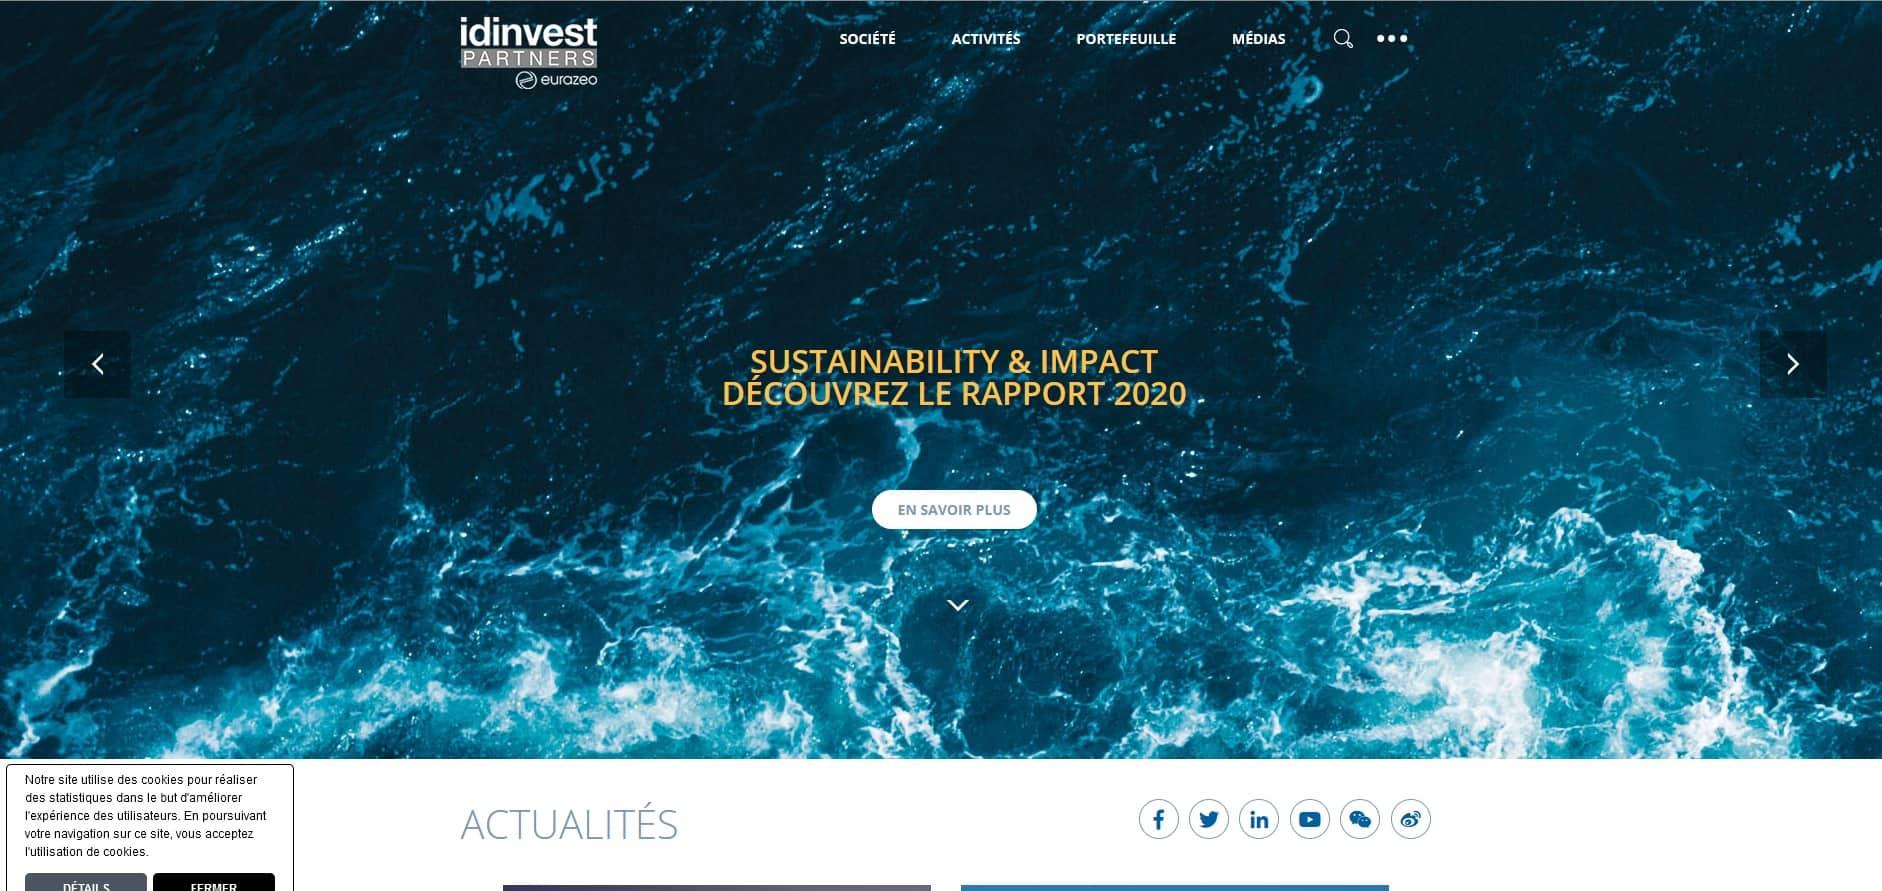 IDInvest Partner